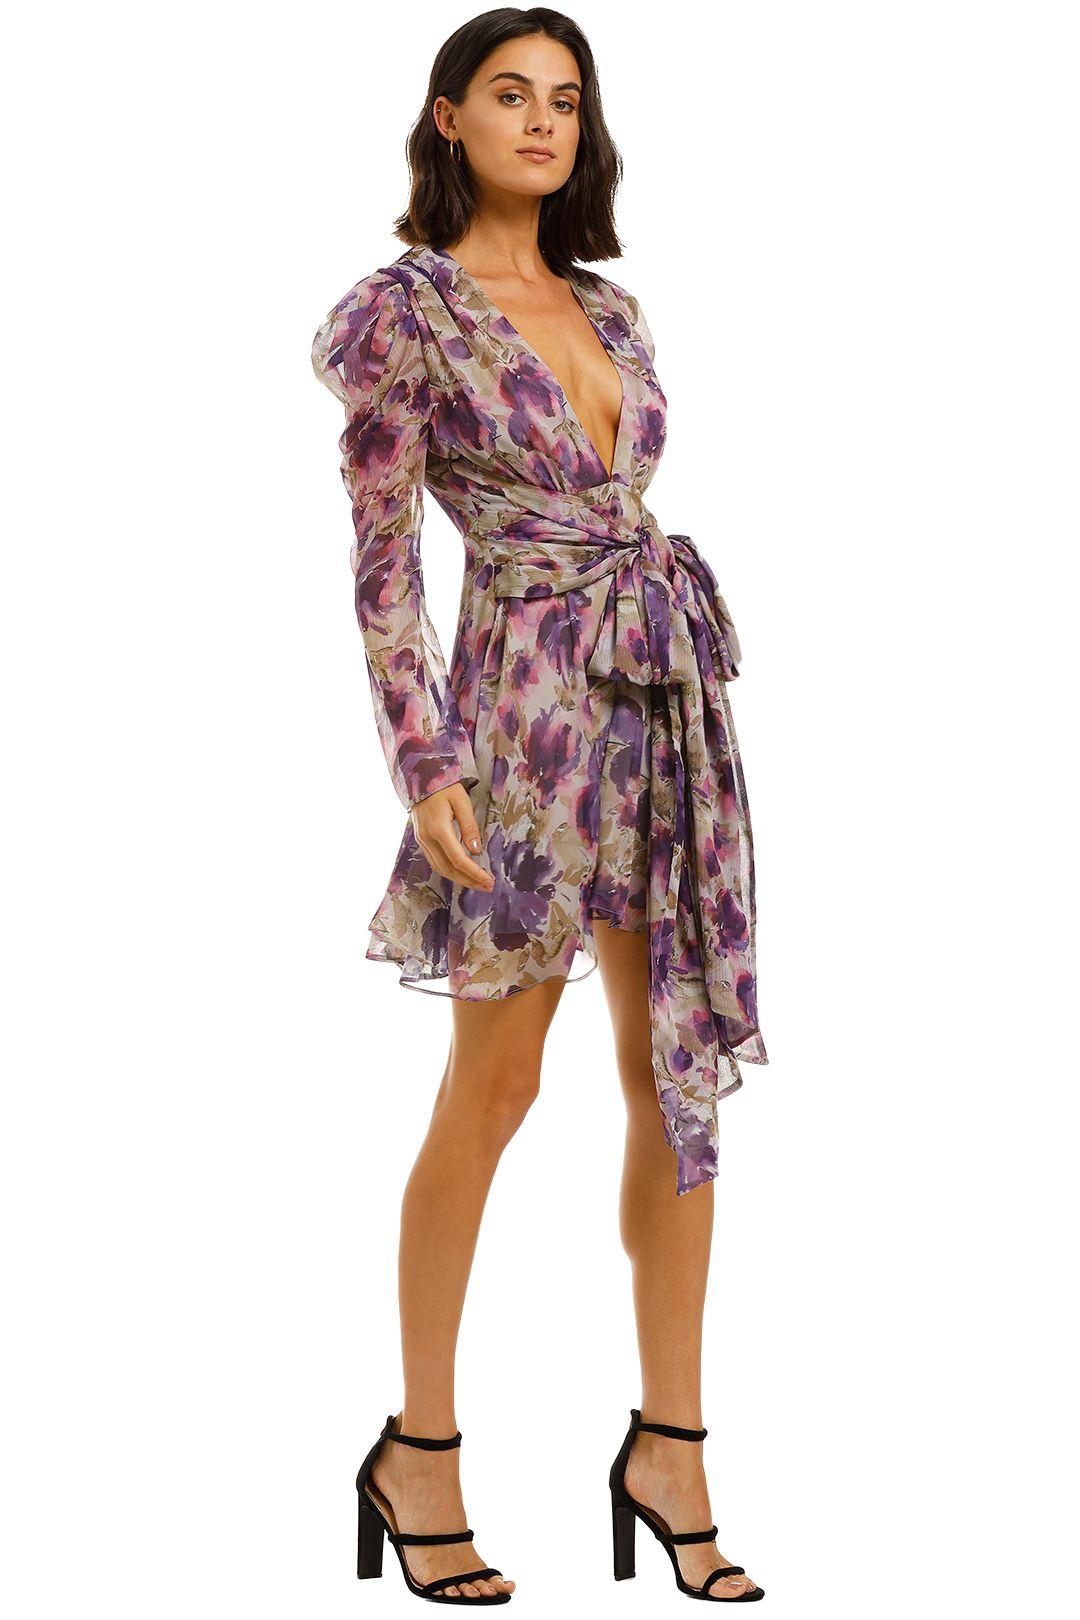 Misha-Nikita-Dress-Floral-Side